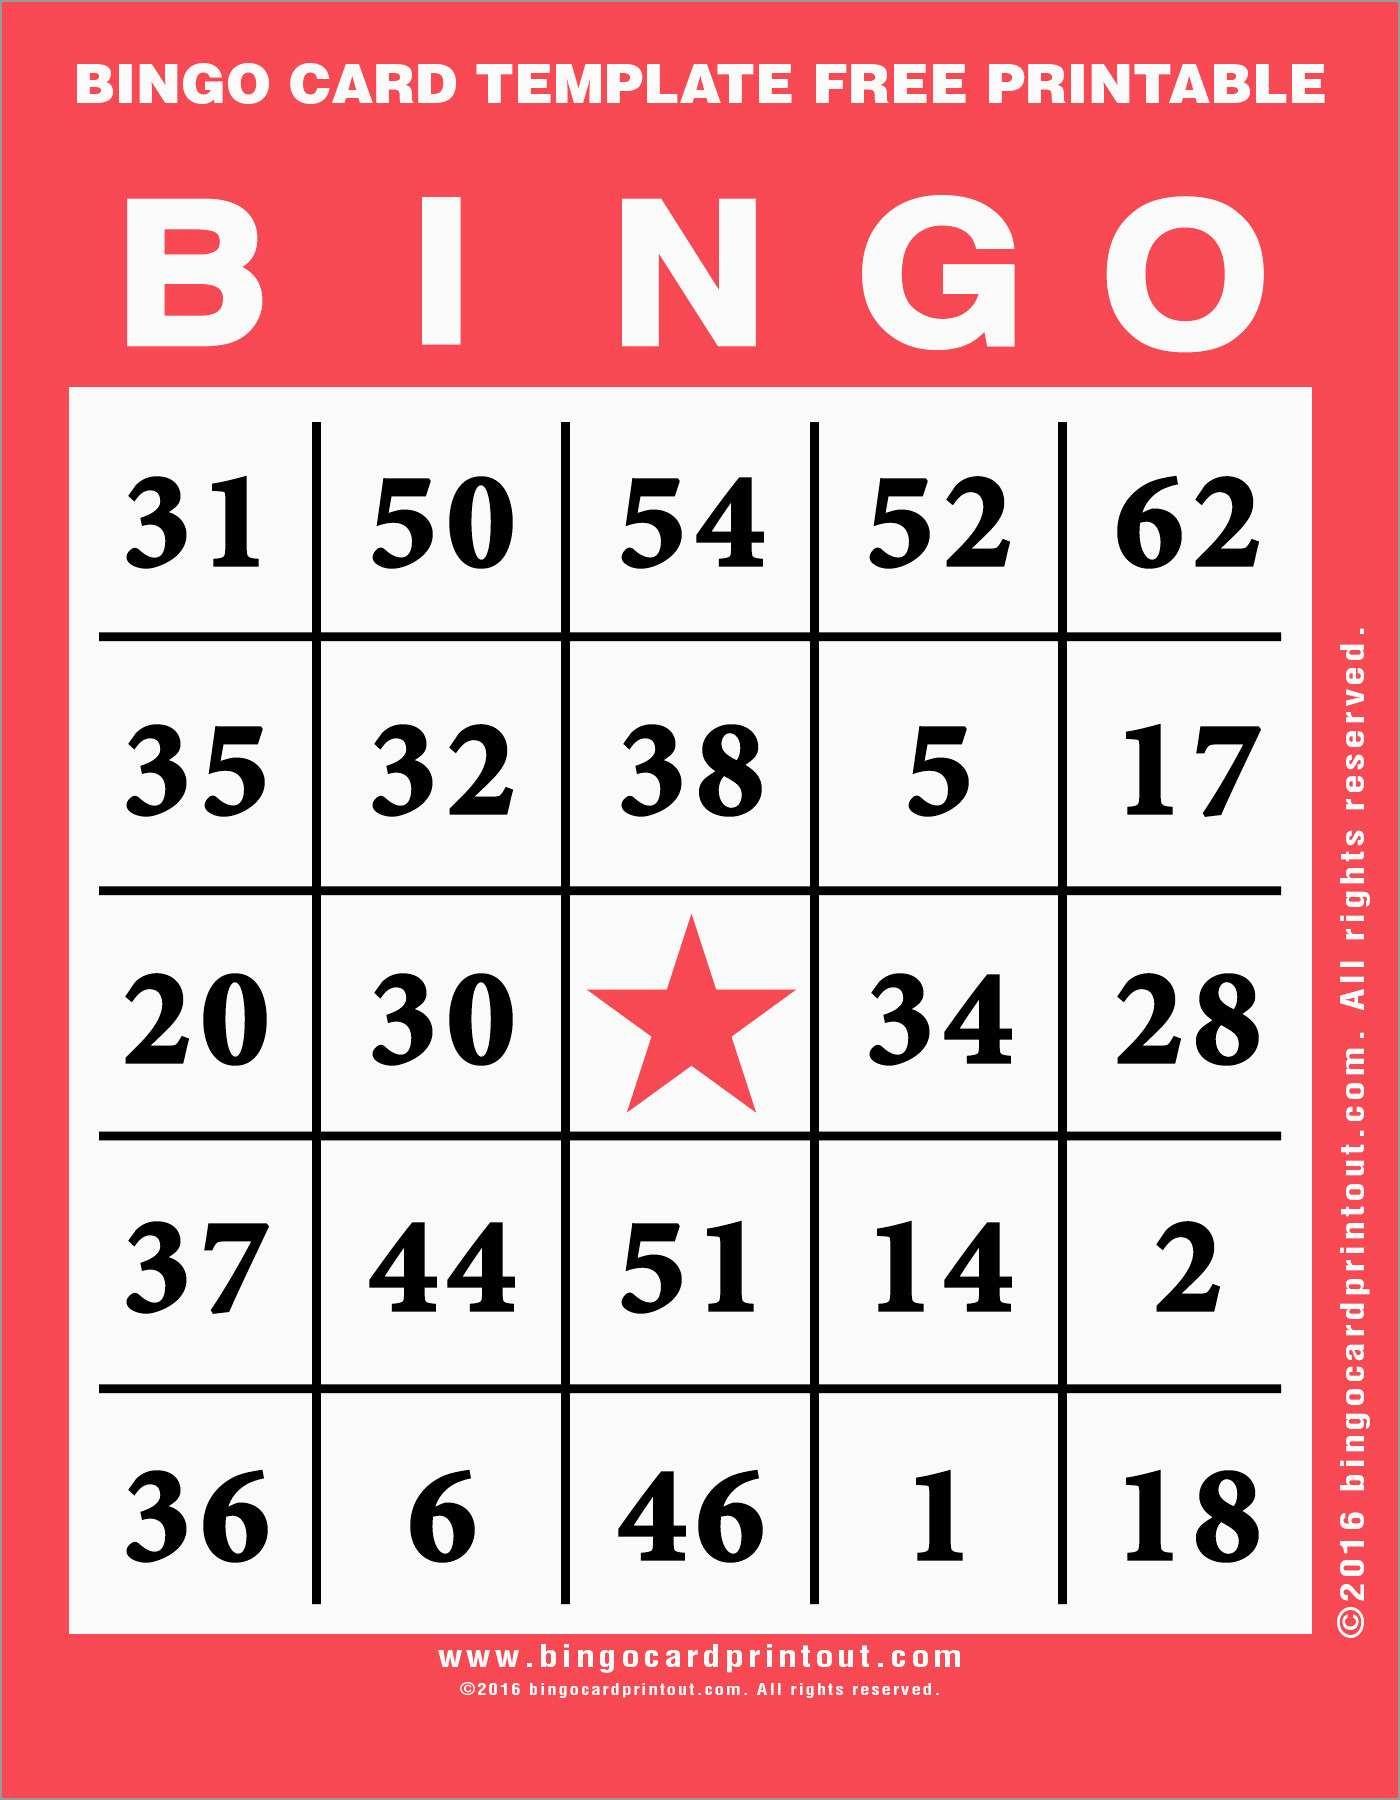 Bingo Card Template Free Great Free Printable Bingo Cards Template - Free Printable Bingo Cards